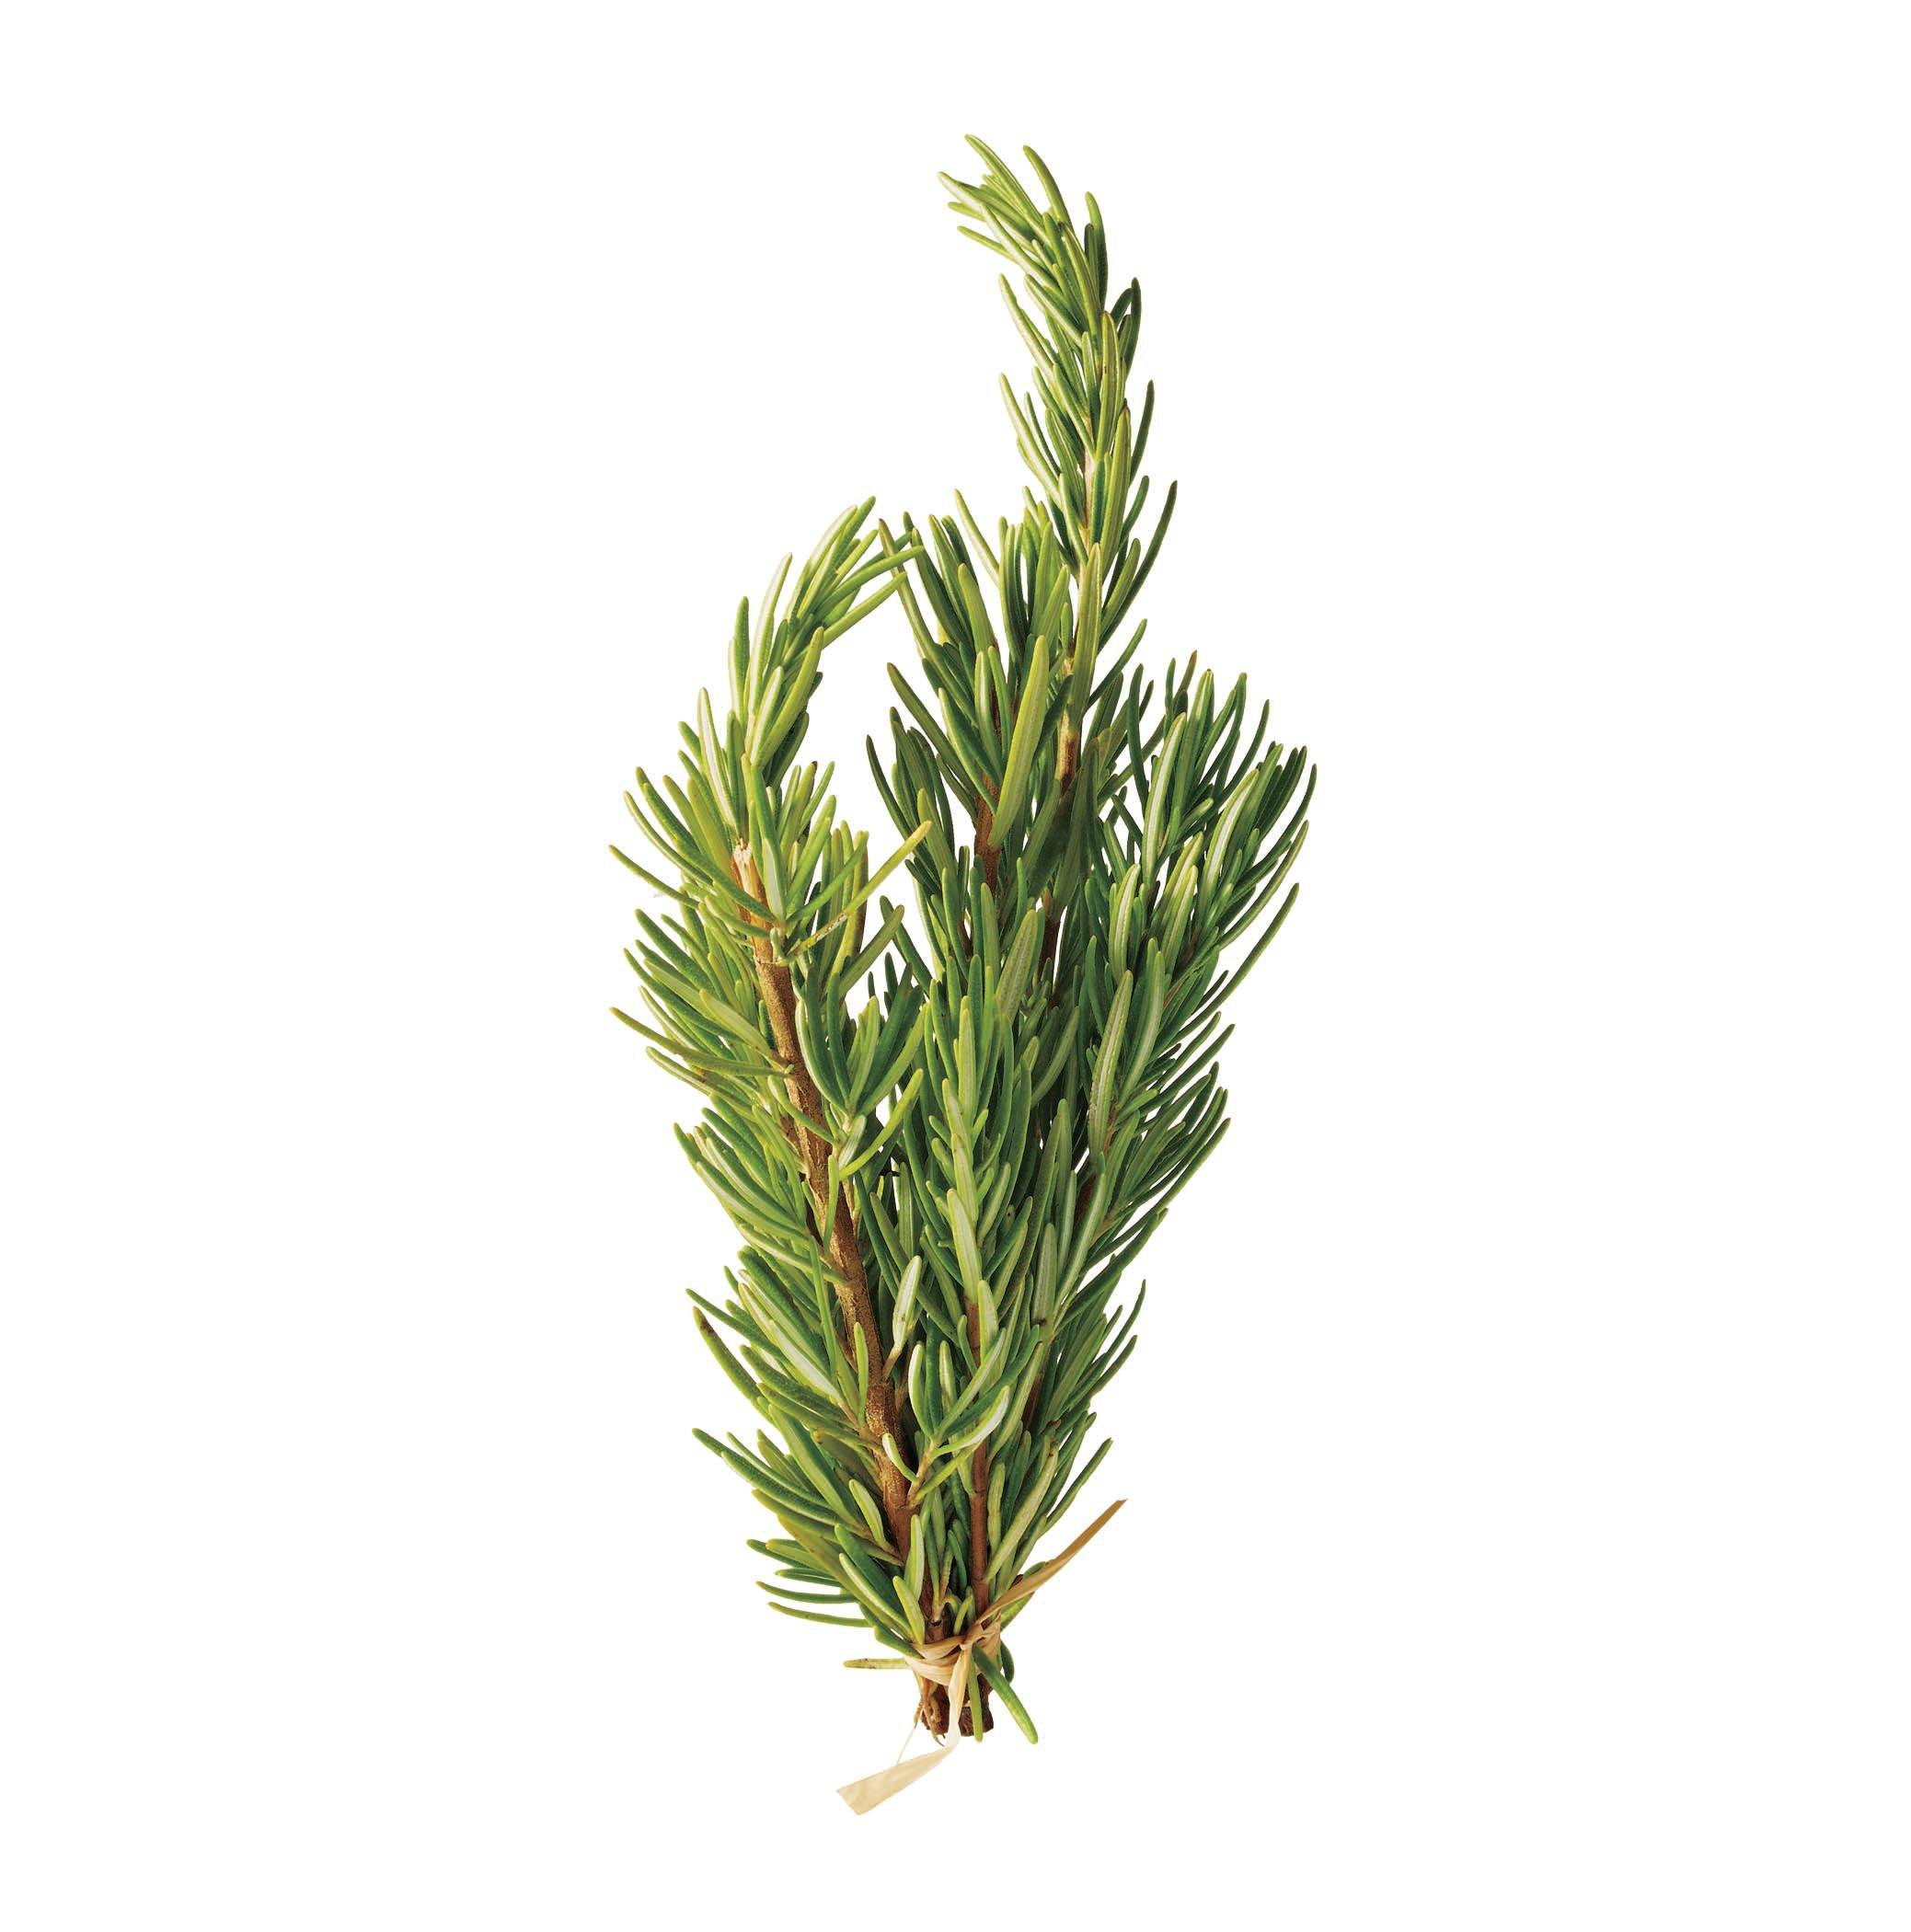 Fresh Rosemary ‑ Shop Herbs & Spices at H‑E‑B